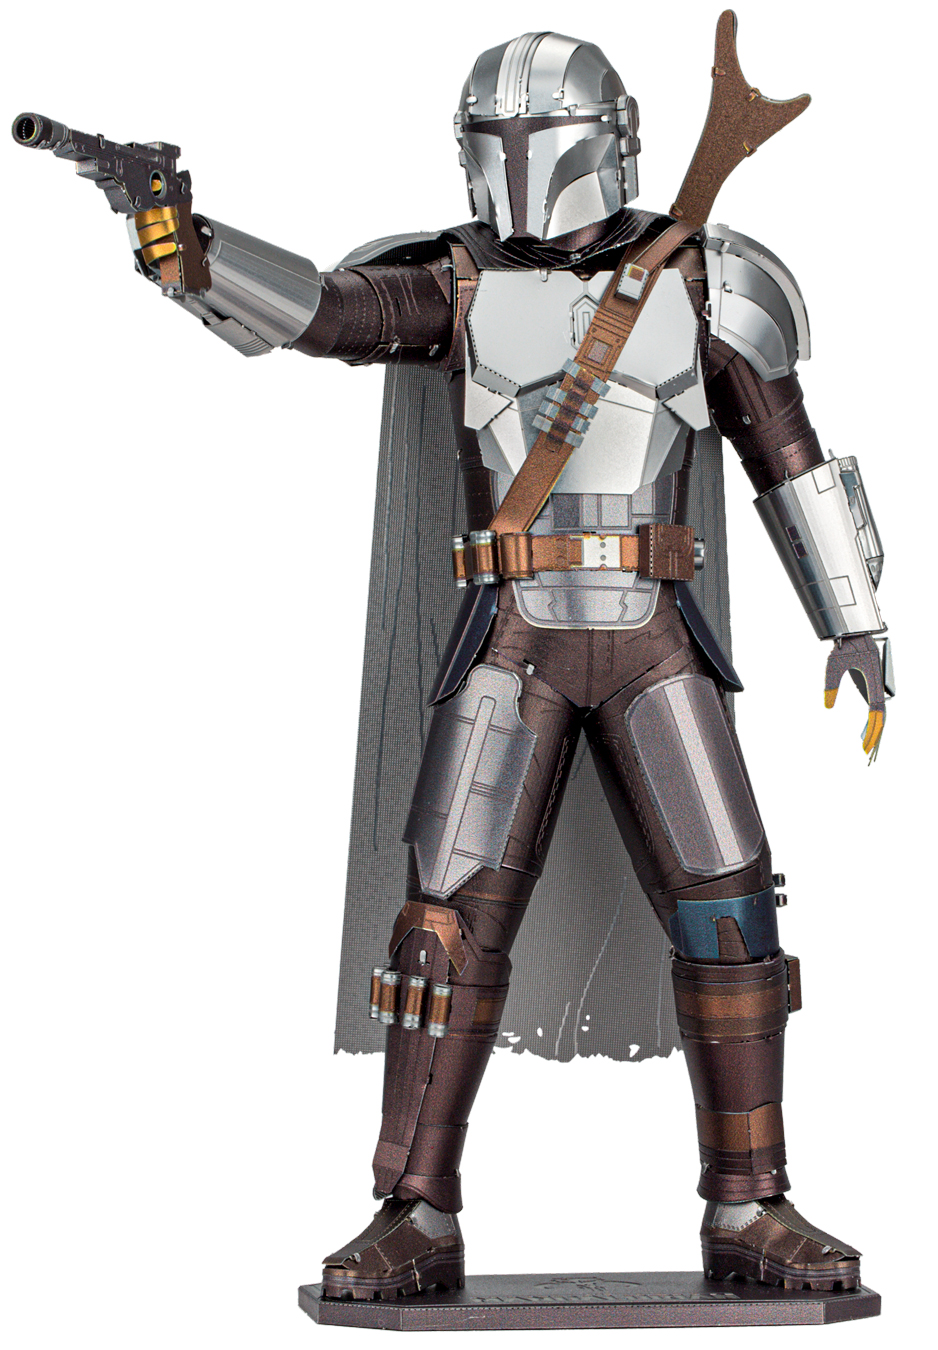 The Mandalorian Star Wars Movies / Books / TV Metal Puzzles